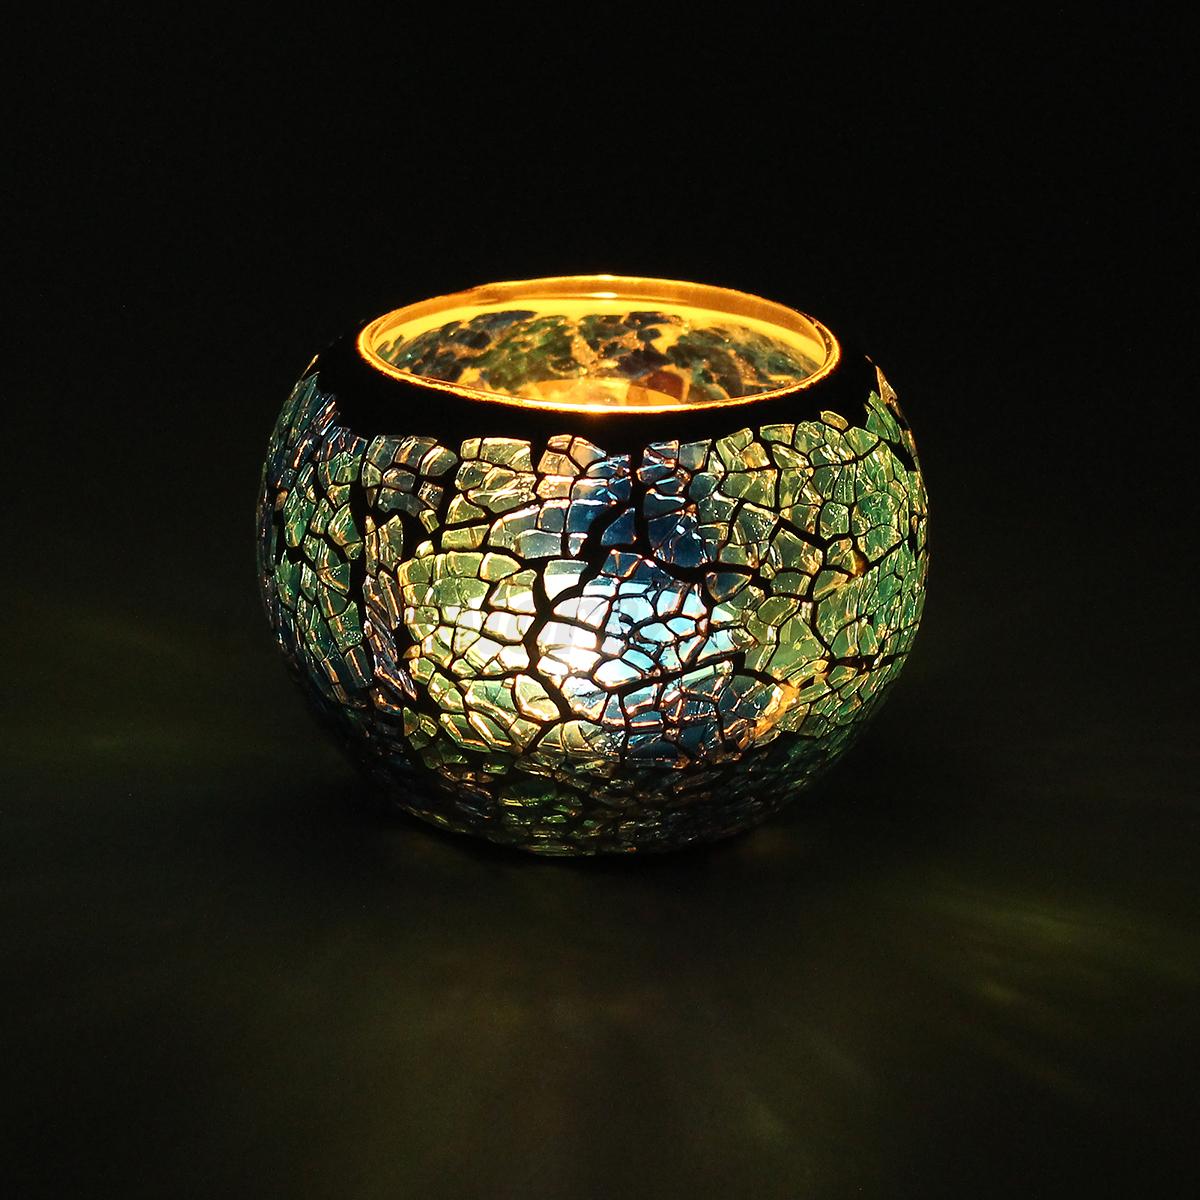 Mosaic Glass Candlestick Candle Holder Candelabra Romantic ...